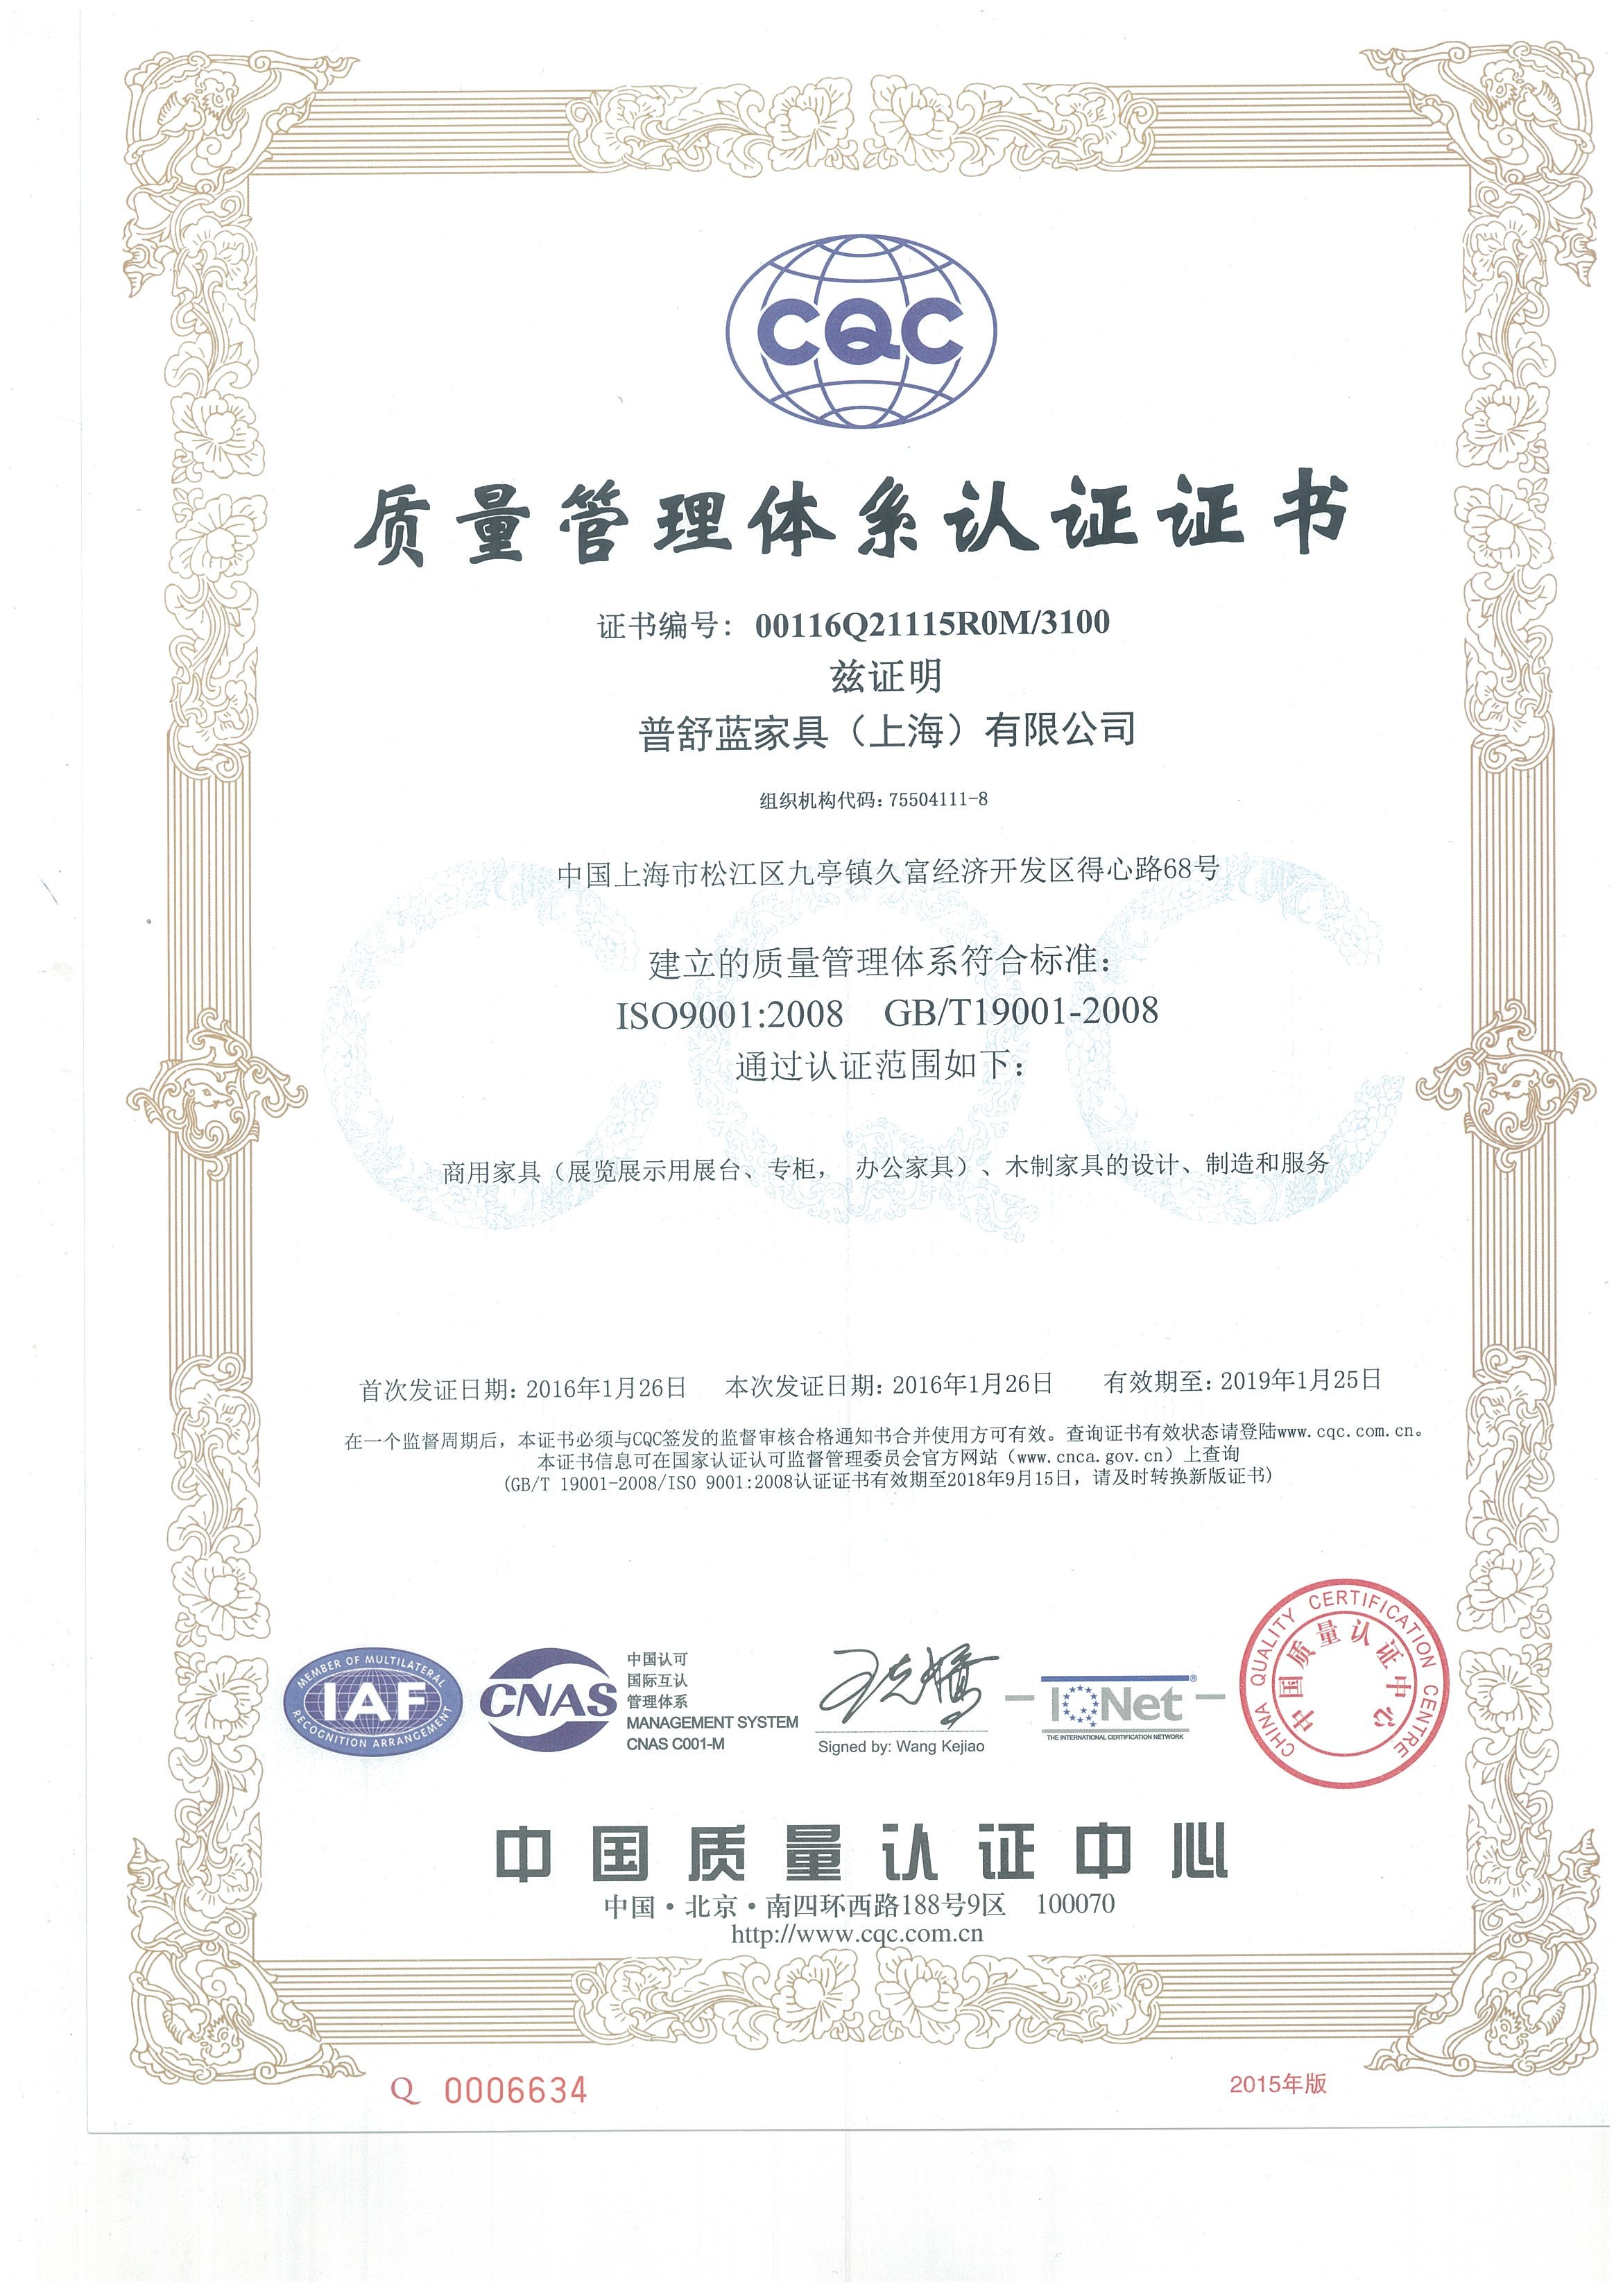 B&R_ISO_CHINESE.jpg